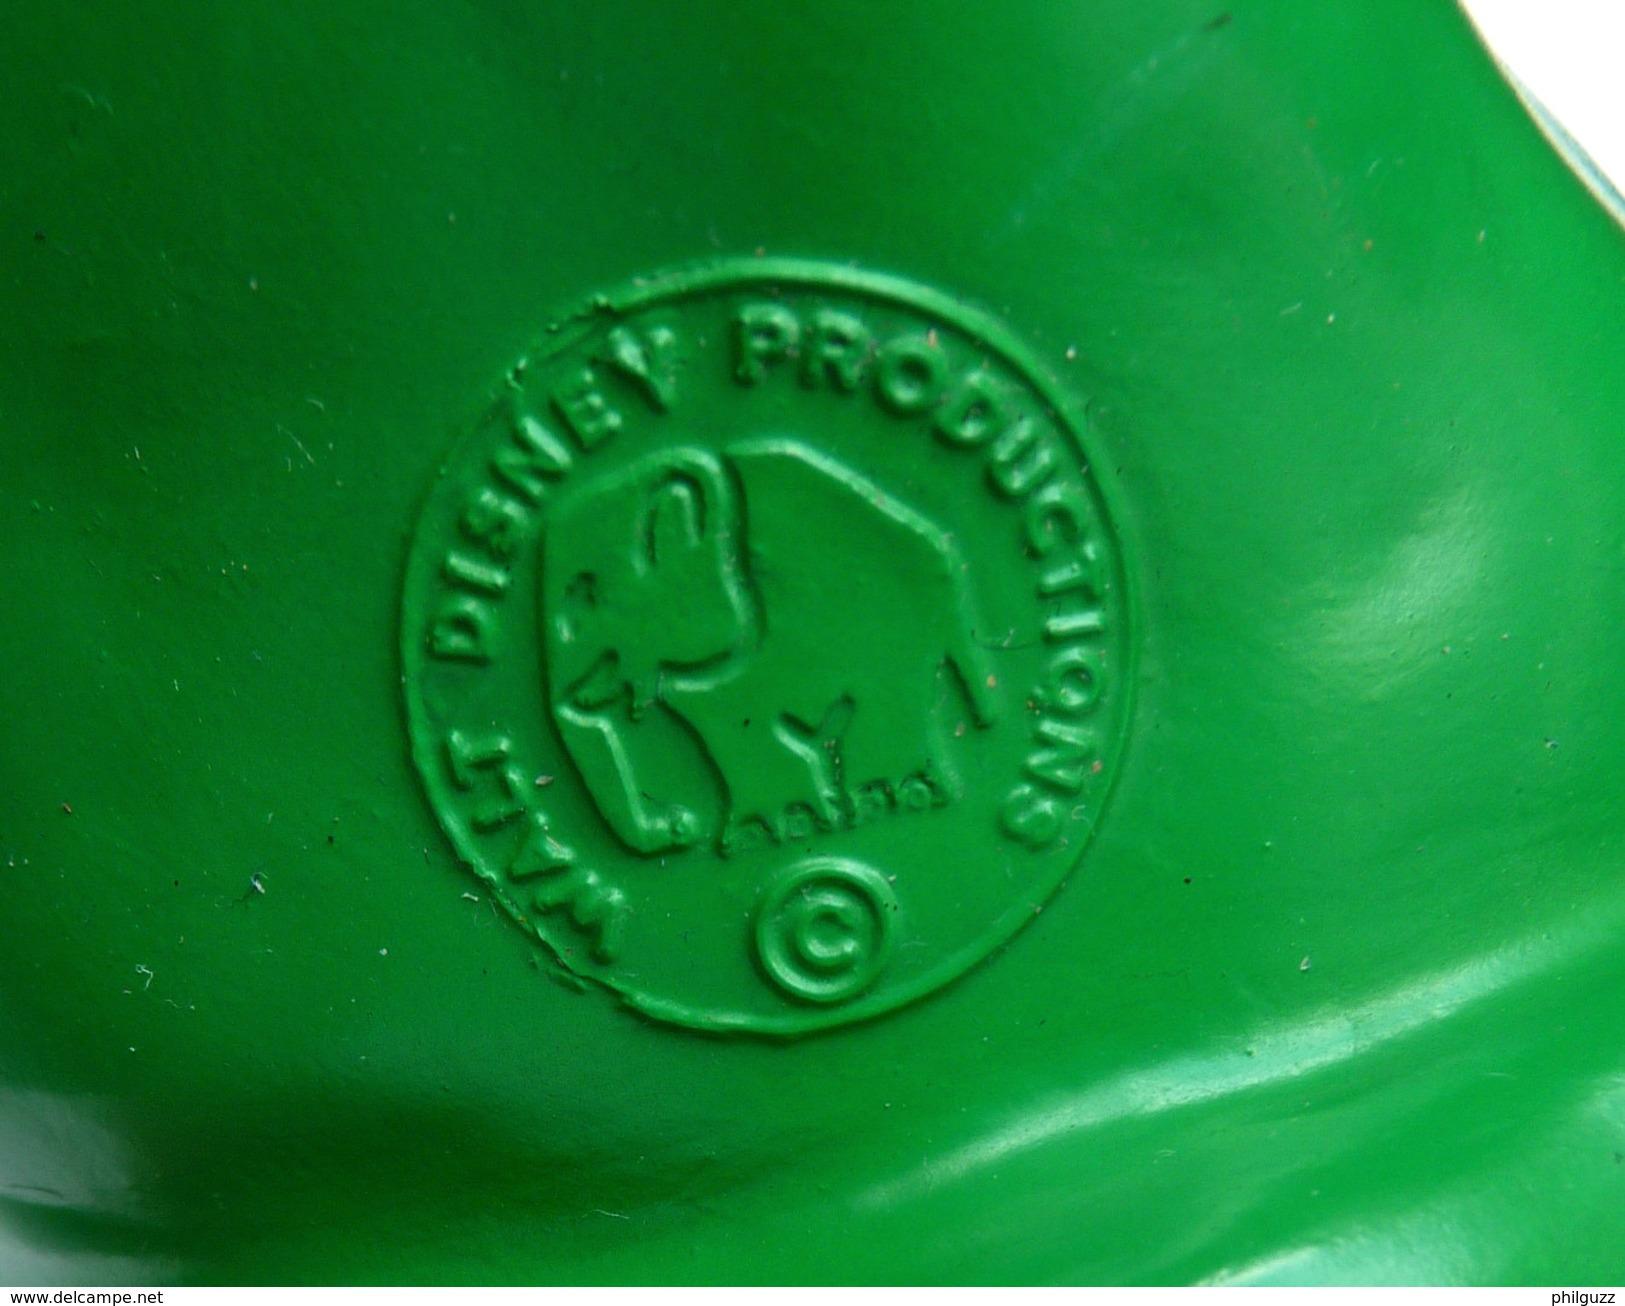 POUET DISNEY - JOYEUX  - LEDRA PLASTICA 1963 FIGURINE NAIN DE BLANCHE NEIGE - Disney